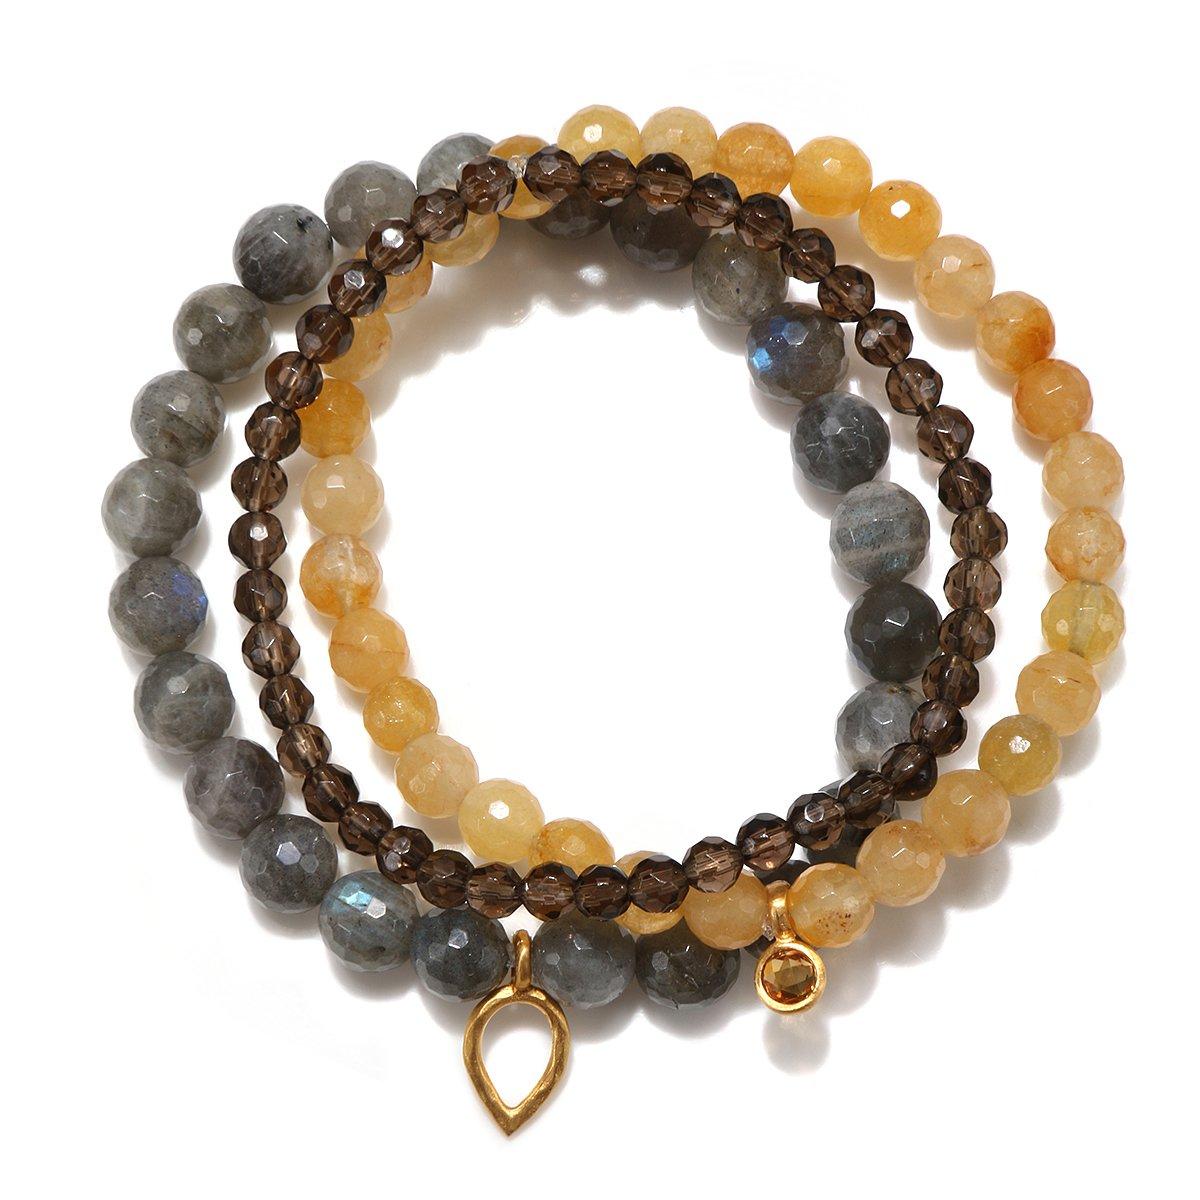 Satya Jewelry Labradorite, Yellow Jade, Smokey Quartz, Citrine Gold Plate Lotus Petal Stretch Bracelet by Satya Jewelry